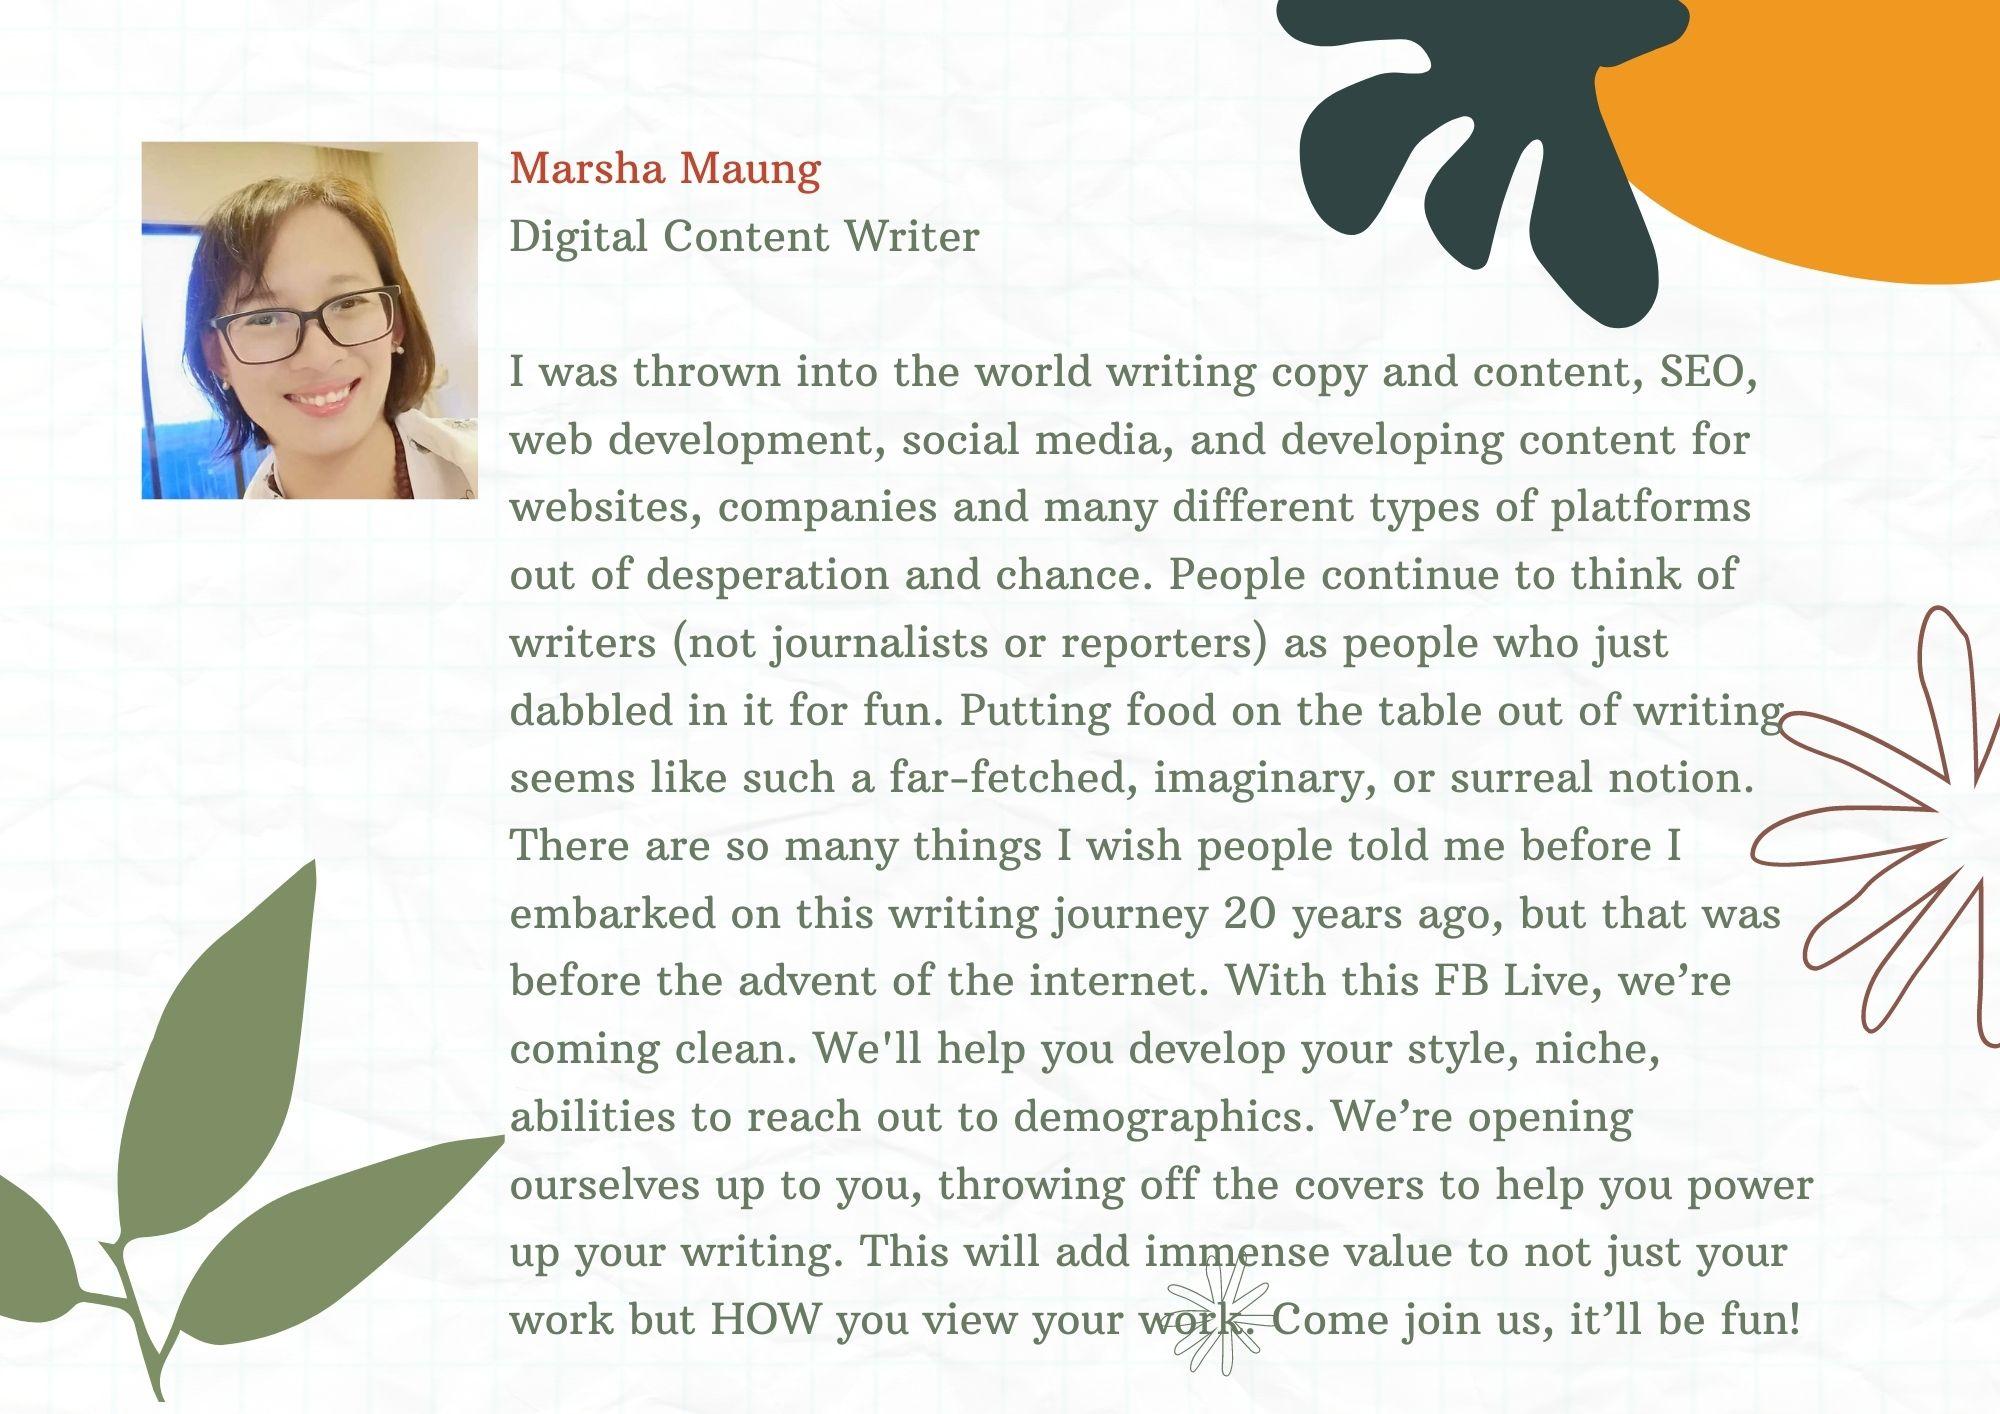 marsha maung SEO writer digital content